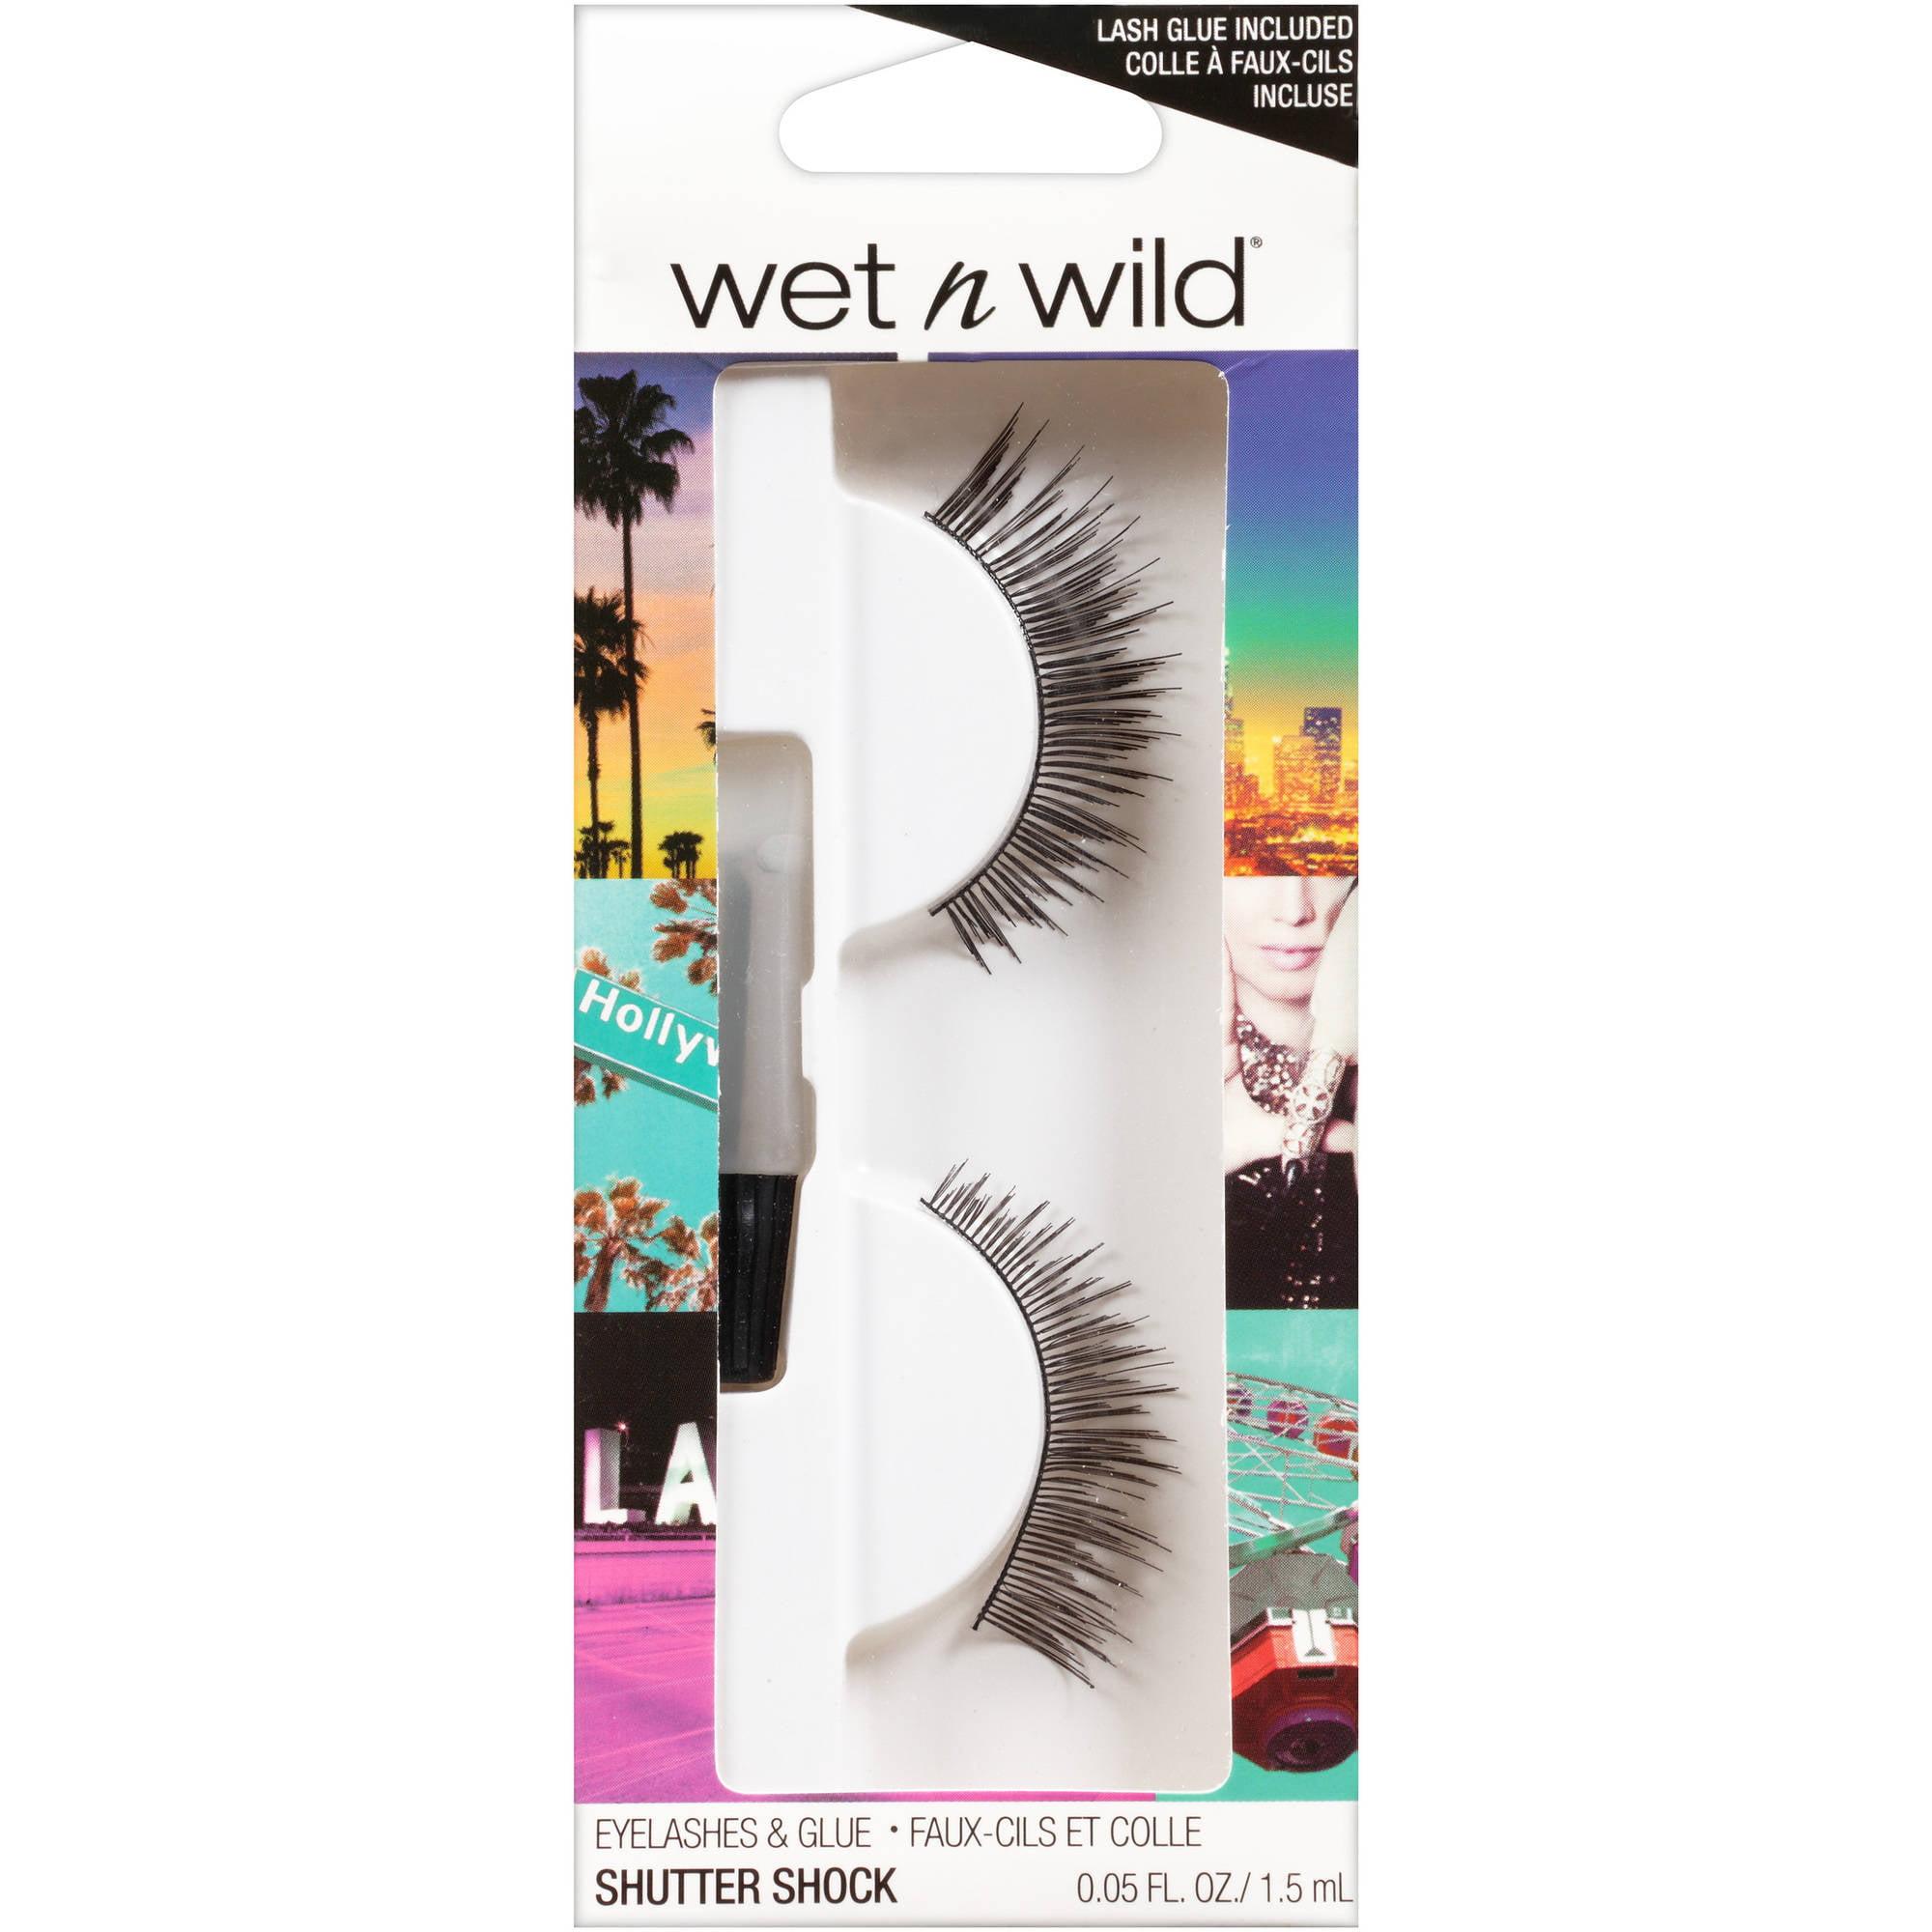 Wet n Wild Eyelashes & Glue, C972A Shutter Shock, 0.05 fl oz